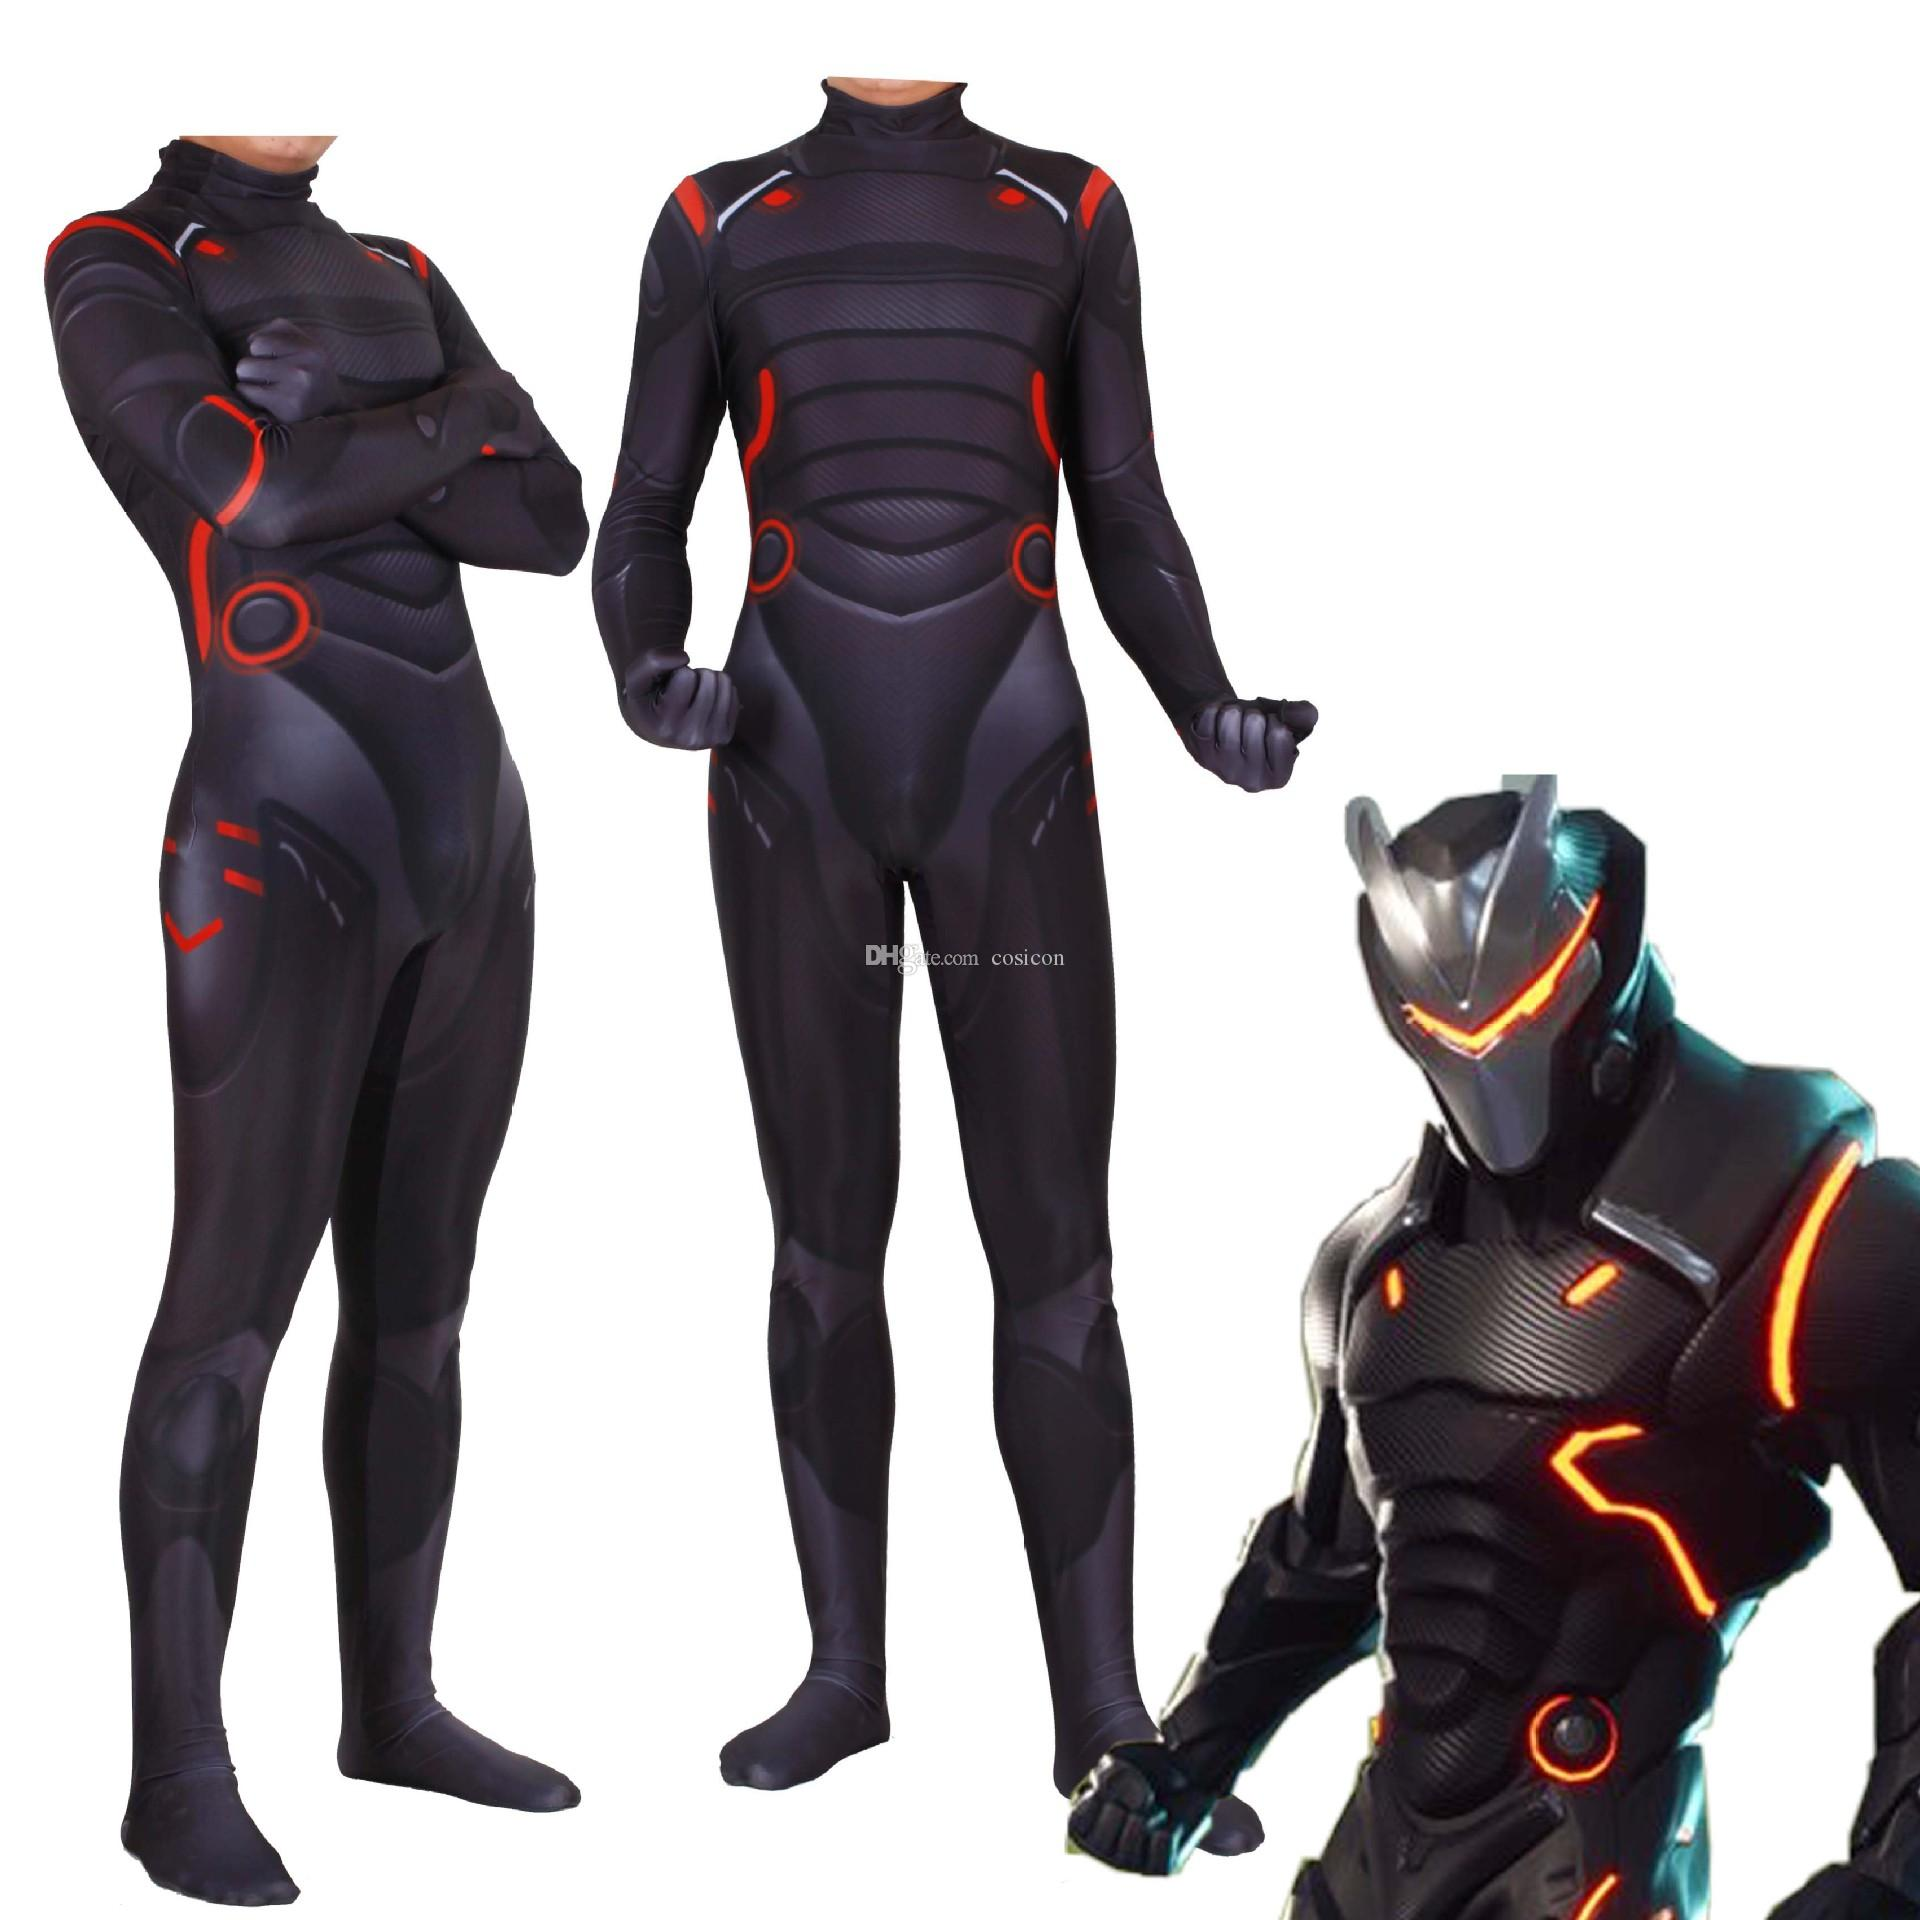 Erwachsene Kinder Heißes Spiel Fortnite Omega Cosplay Body Zentai Kostüm Omega Haut Jumpsuit Halloween Cosplay Kostüm